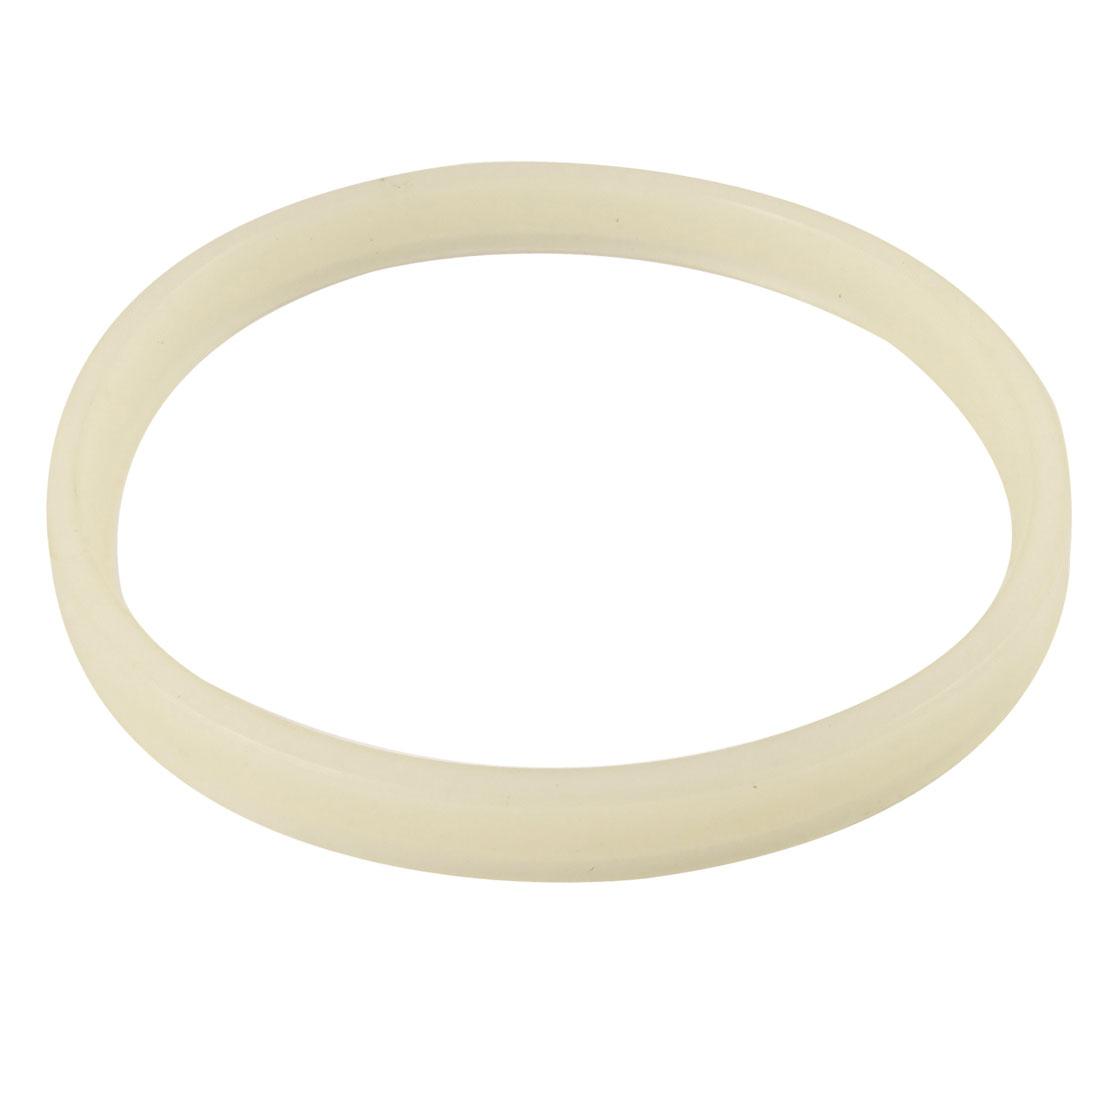 150mm x 140mm x 12mm Beige Polyurethane Pressure Oil Seal